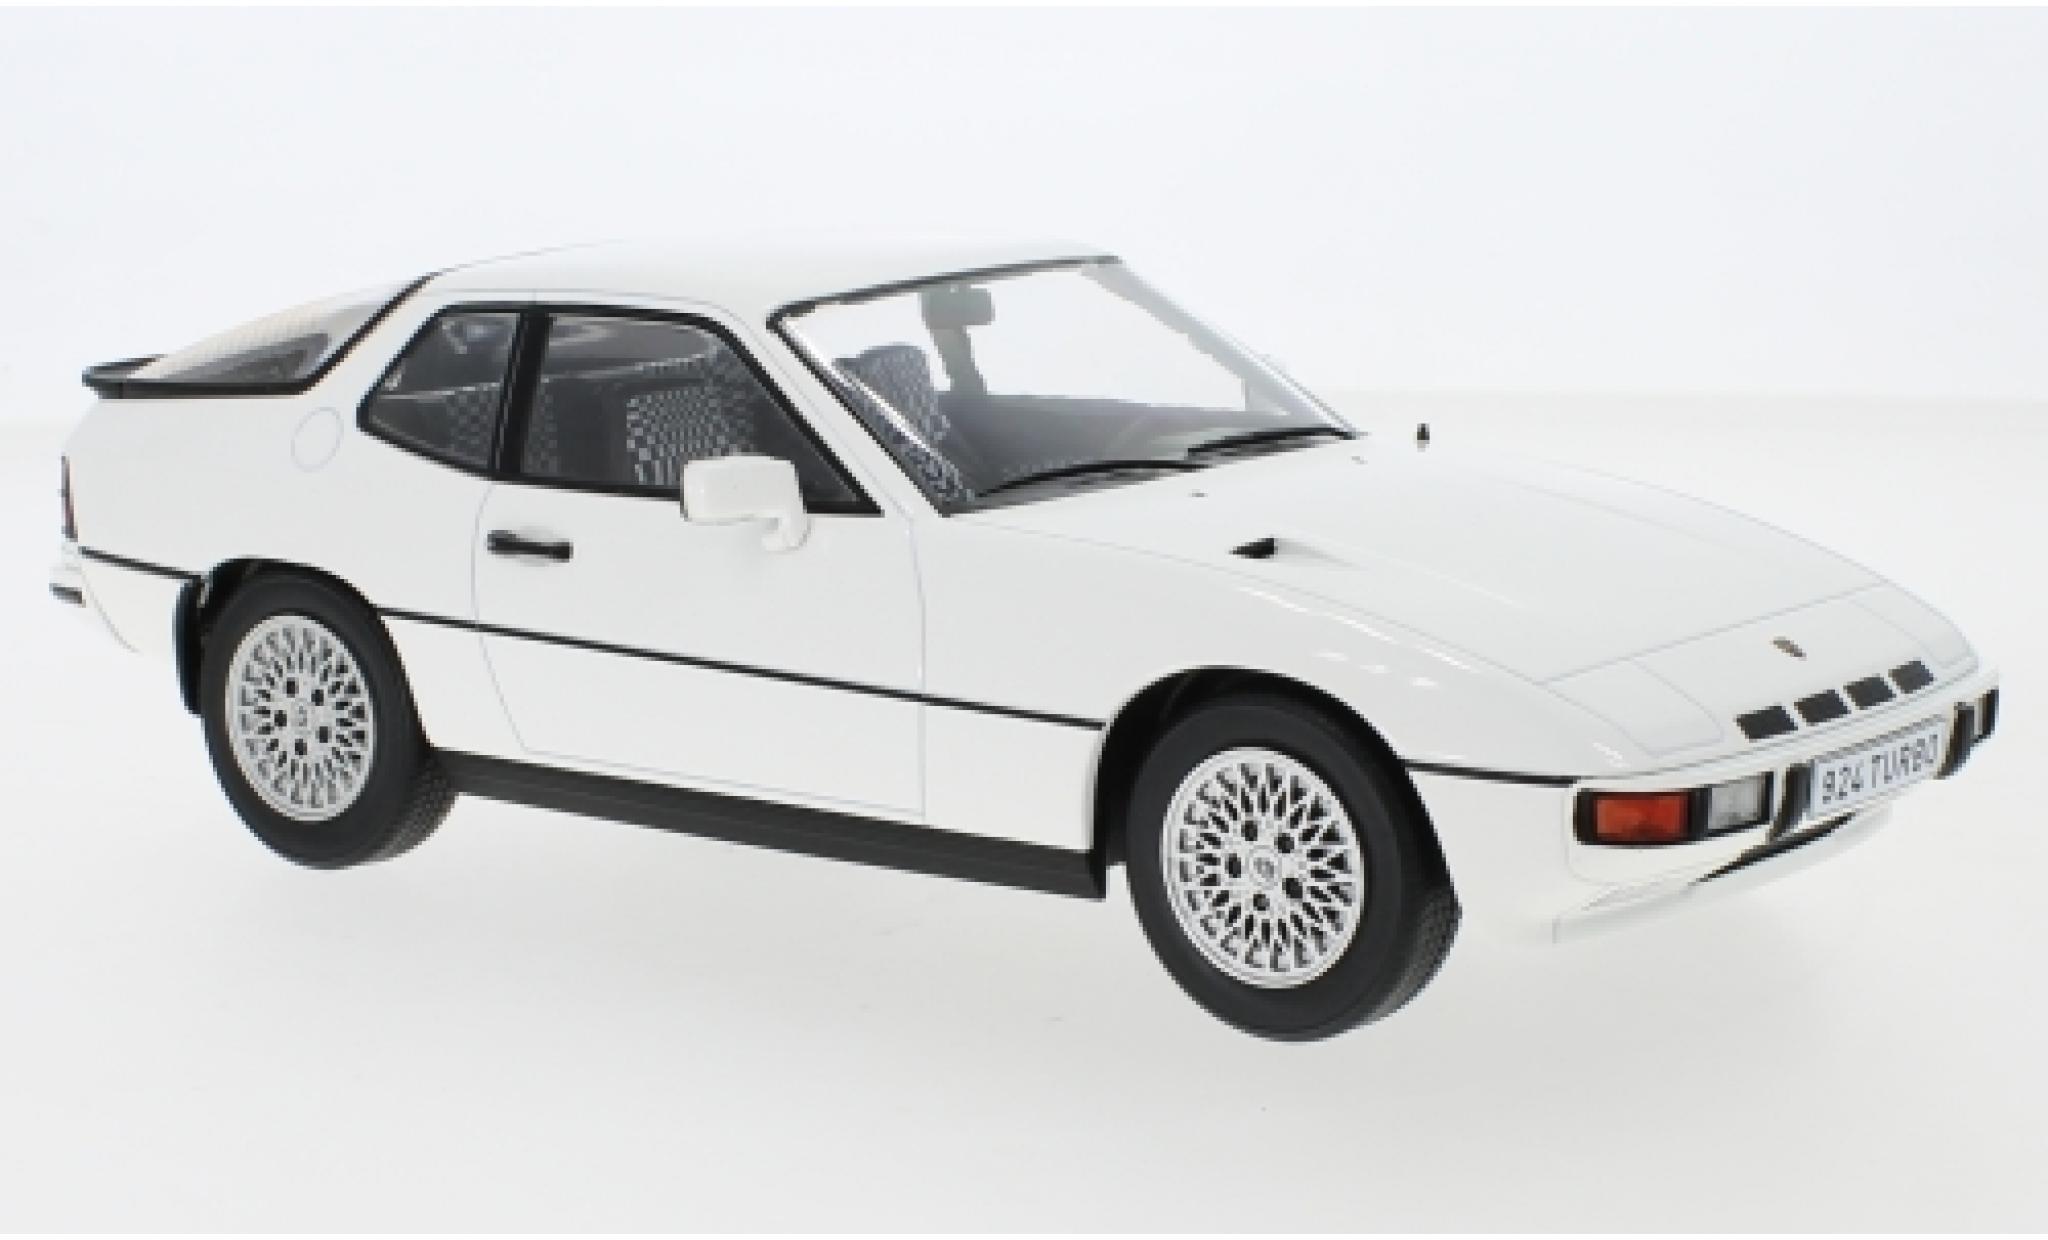 Porsche 924 1/18 MCG Turbo white 1979